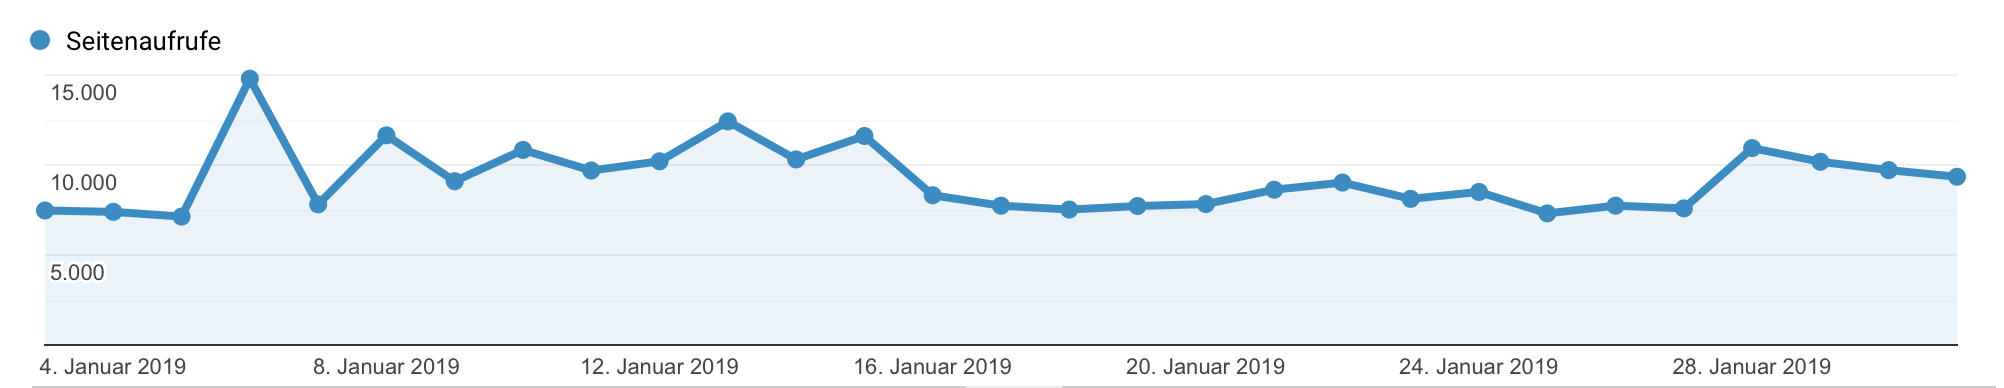 Seitenaufrufe pro Monat